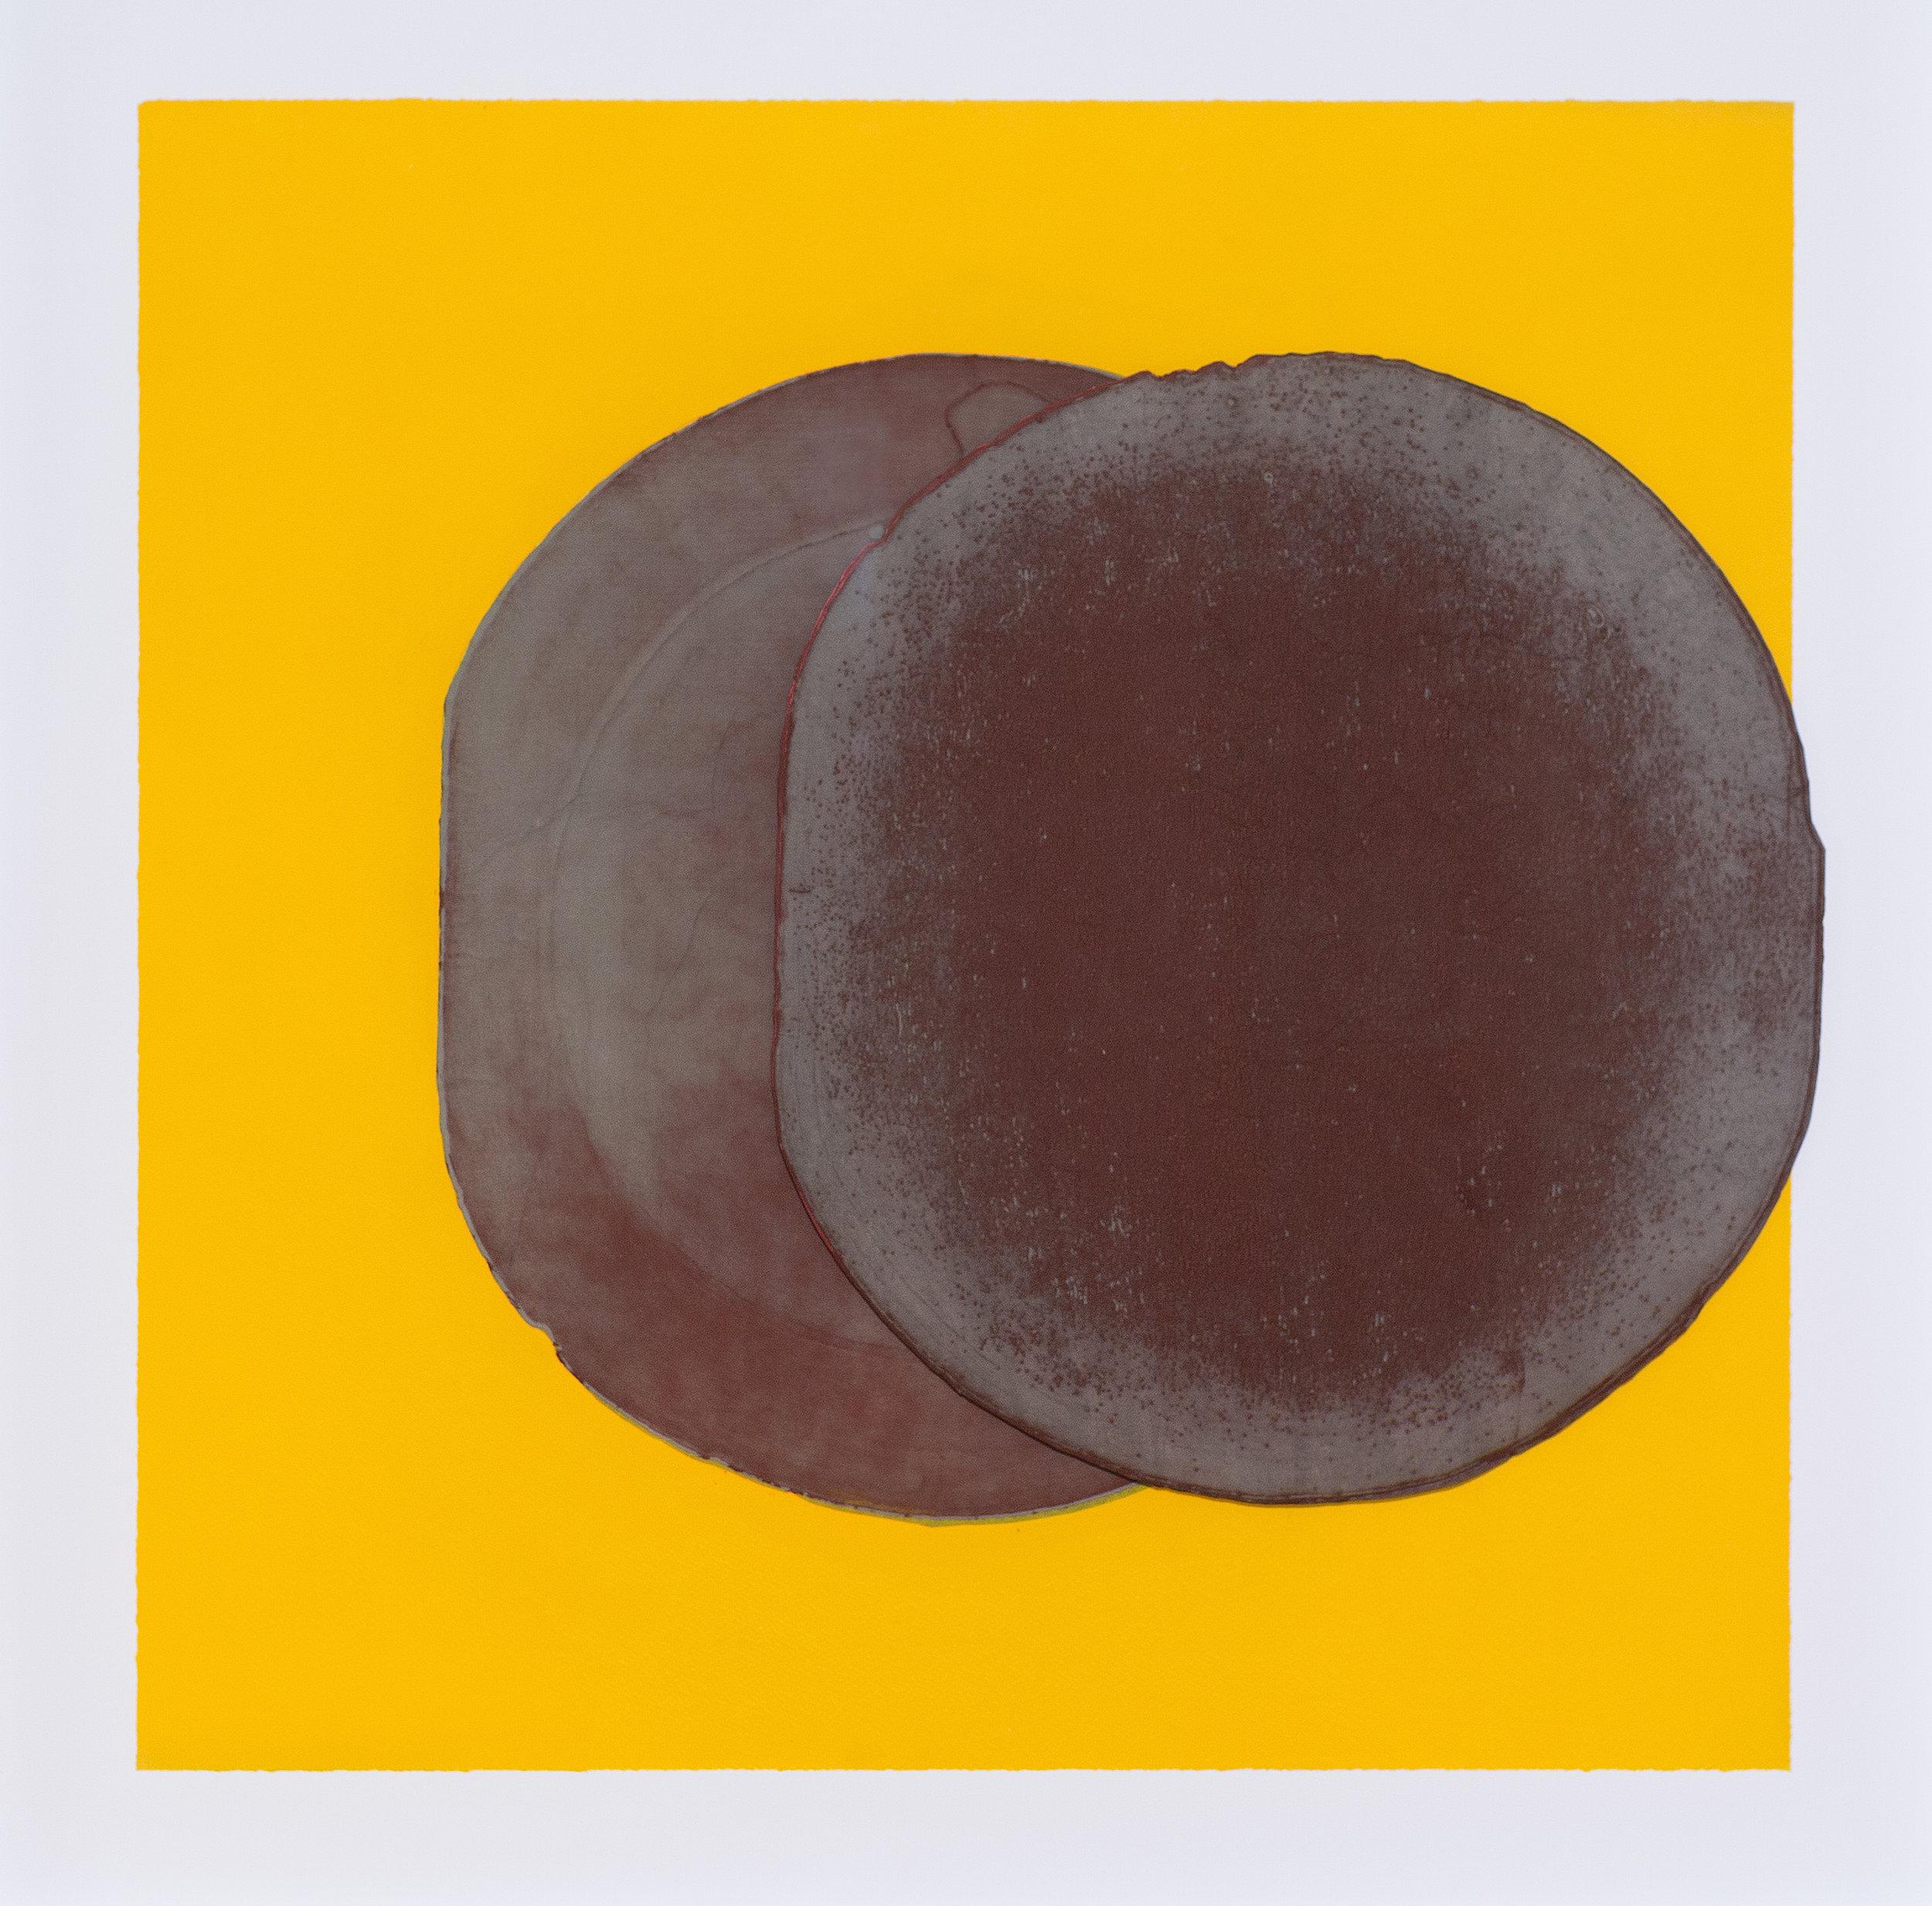 El Anatsui  Sage Grey Eclipse , 2016 Intaglio print with collage and chine-collé 98.5 x 98.5 cm Edition 1/3